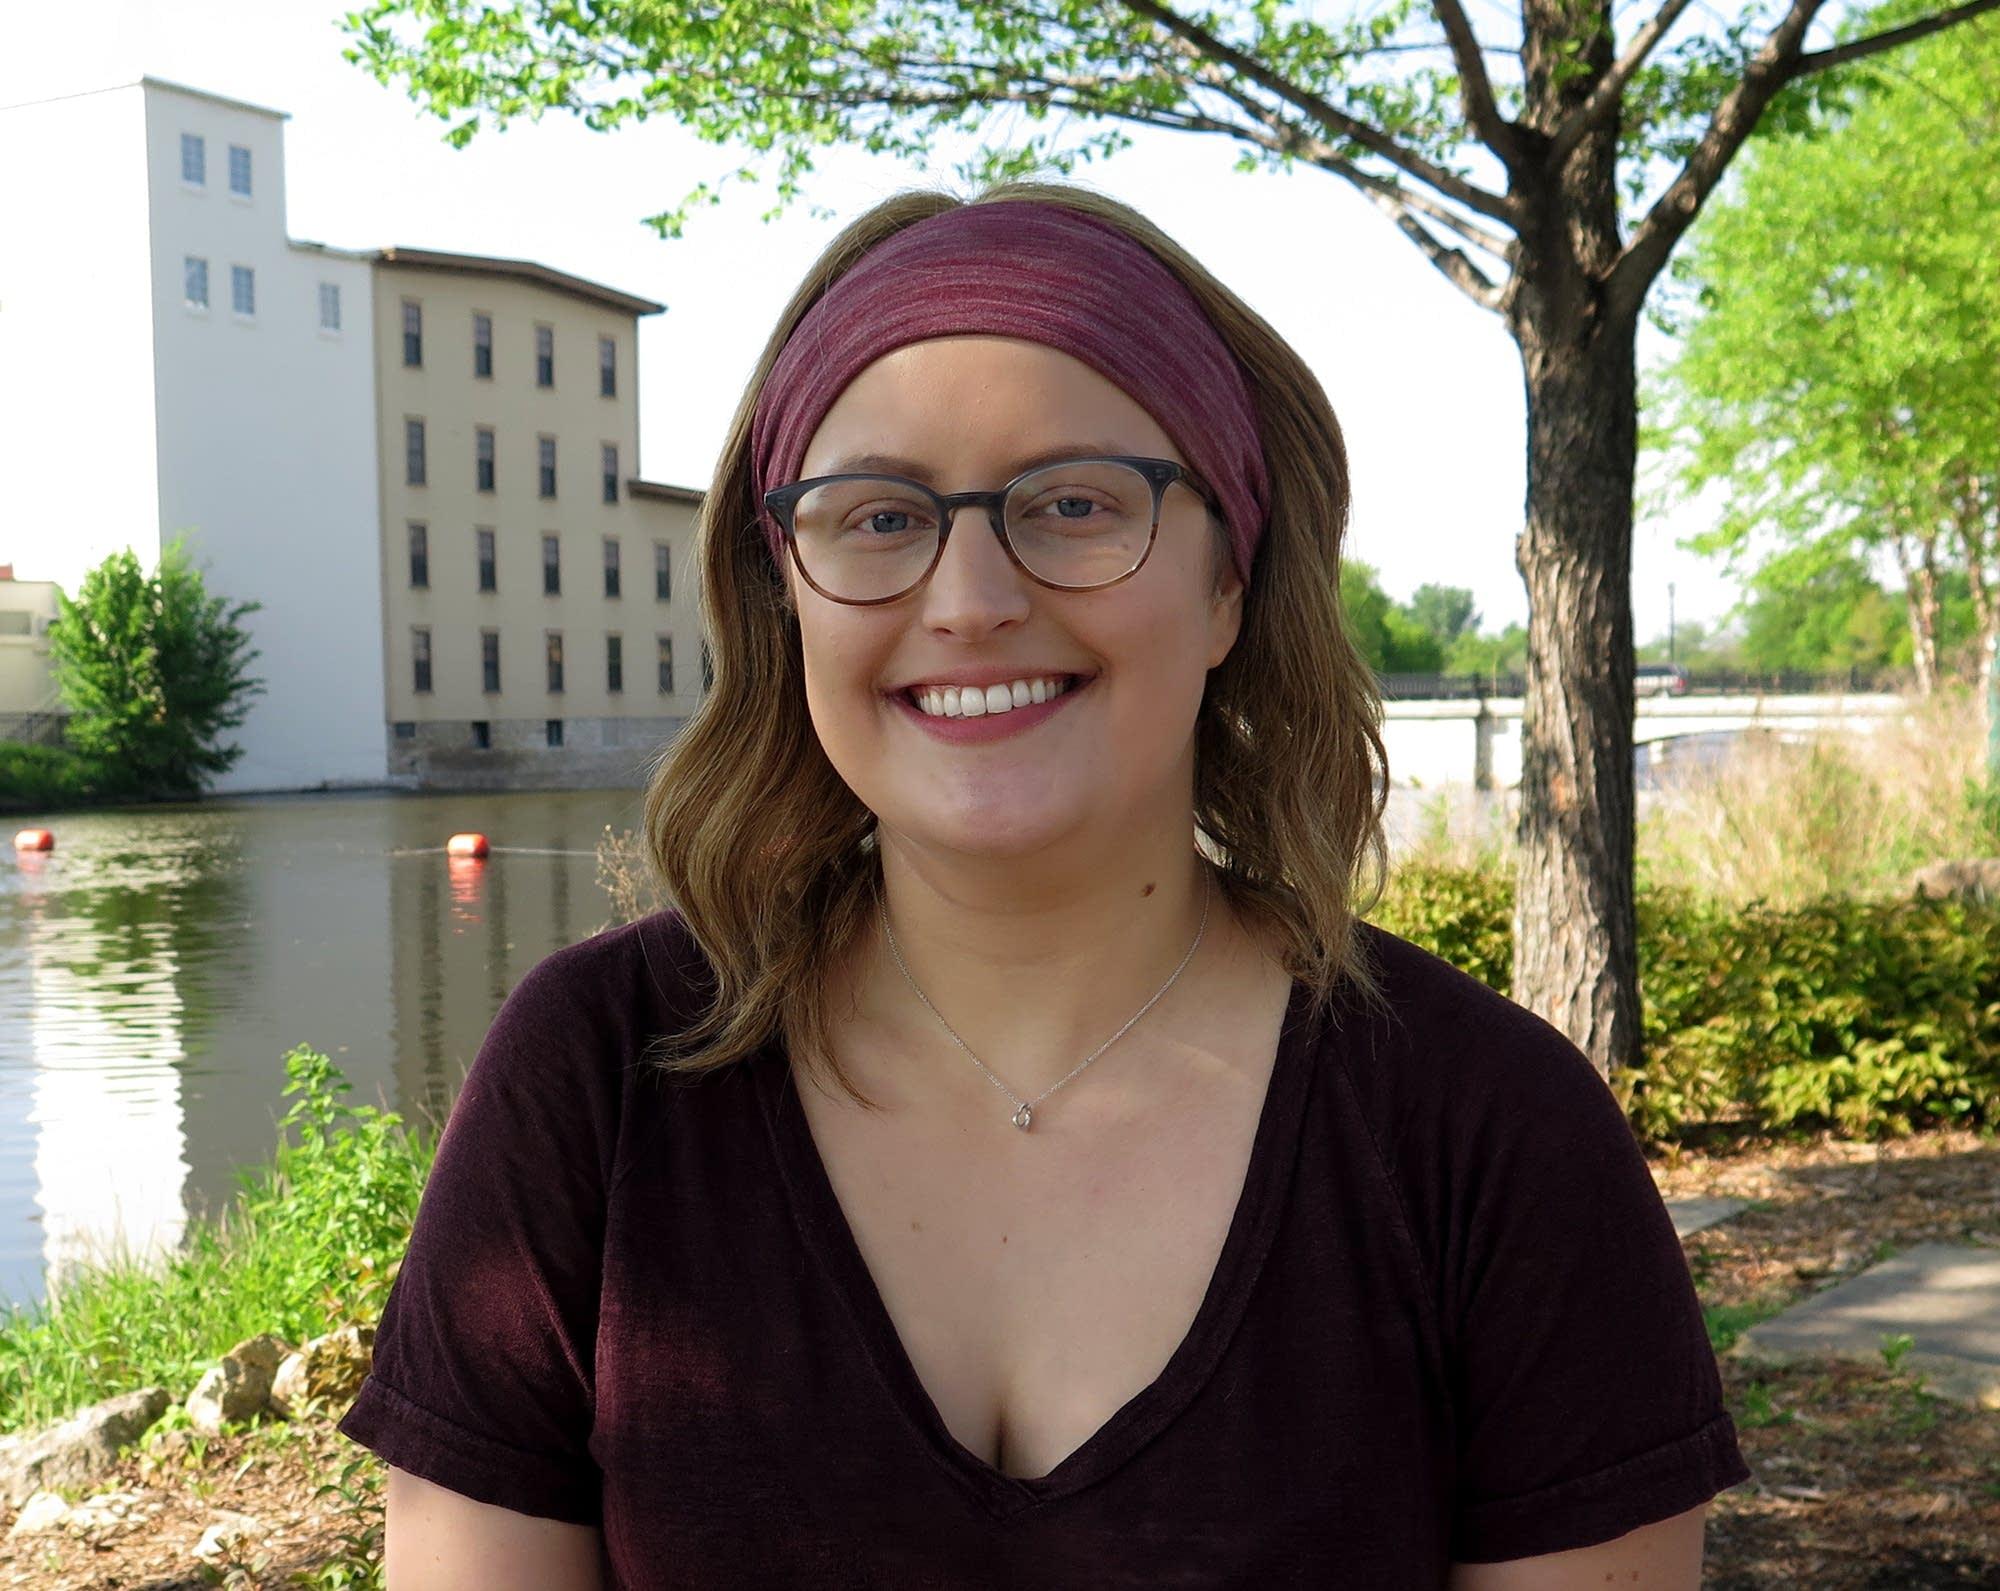 St. Olaf College sophomore Kathryn Cora Hinderaker